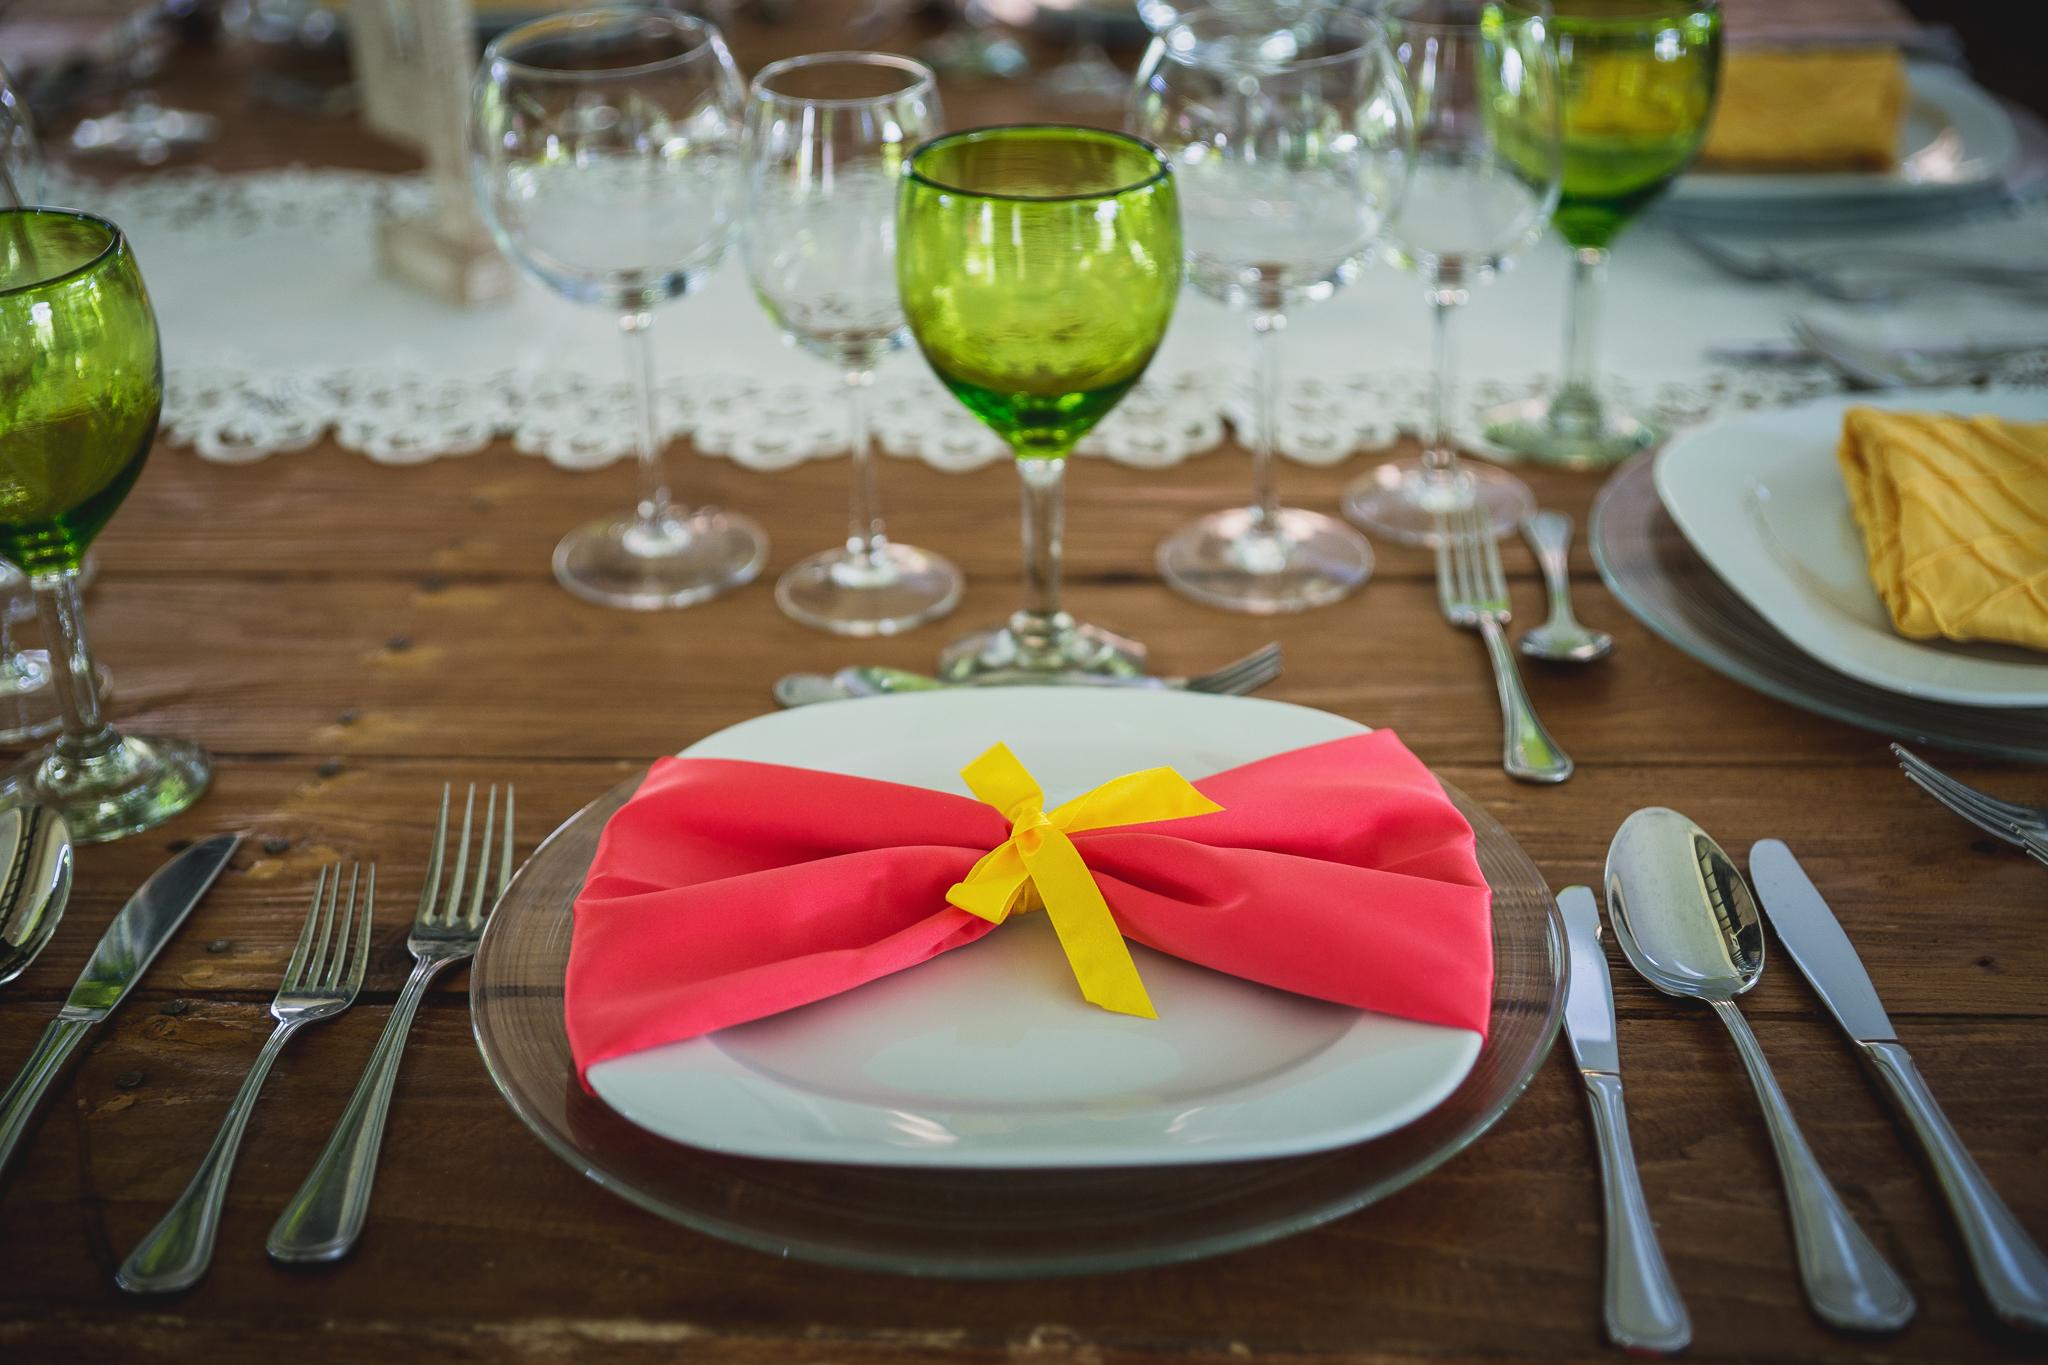 wedding-photography-mexico-quinta-rubelinas-17.jpg